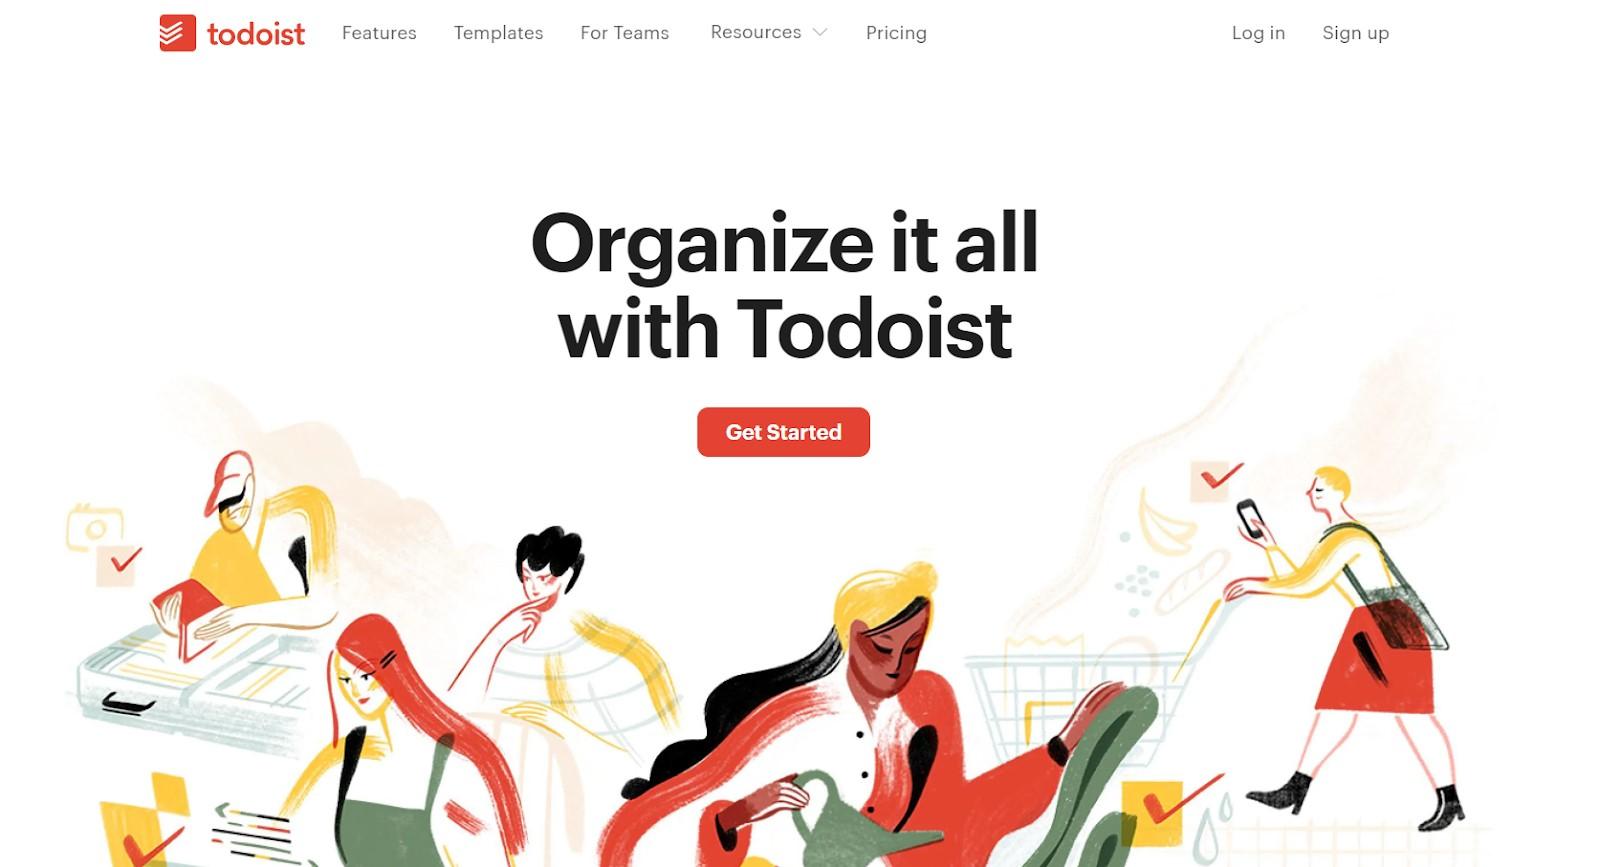 todoist main page screenshot